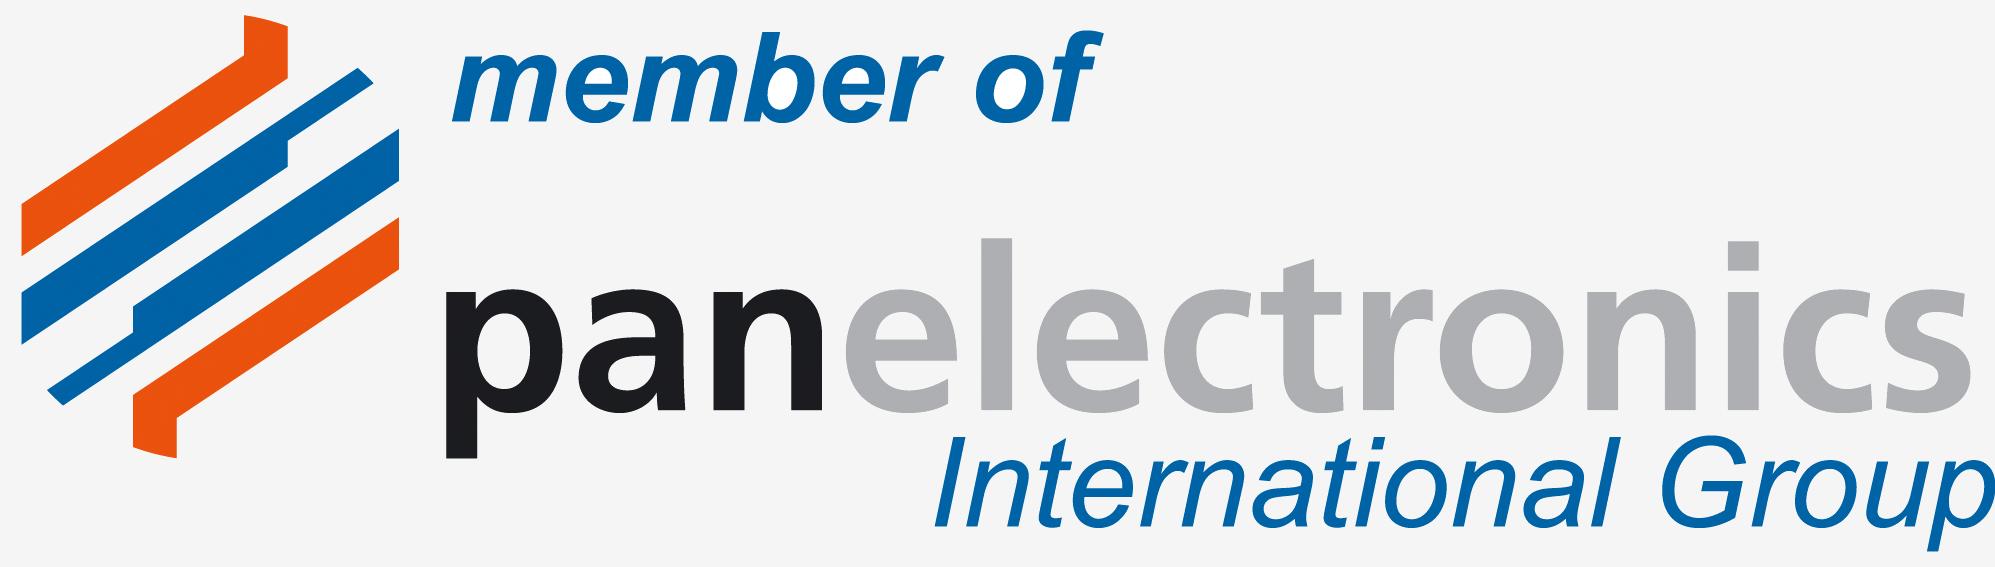 Panelectronics Logo